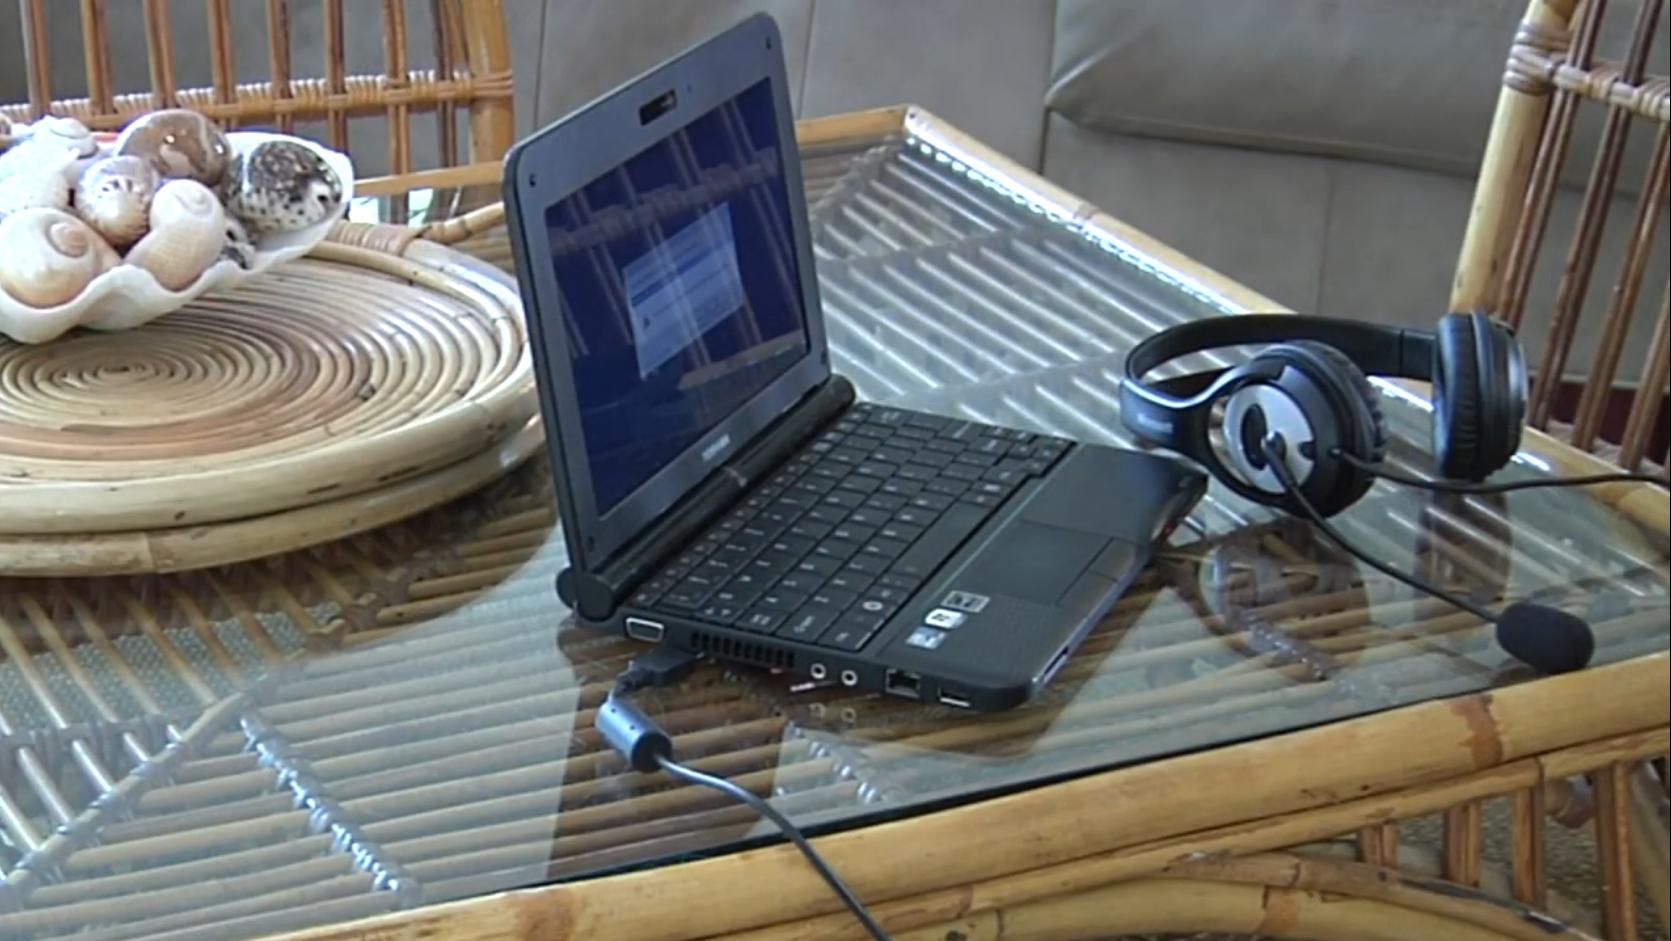 Computer & headphones sitting on desk